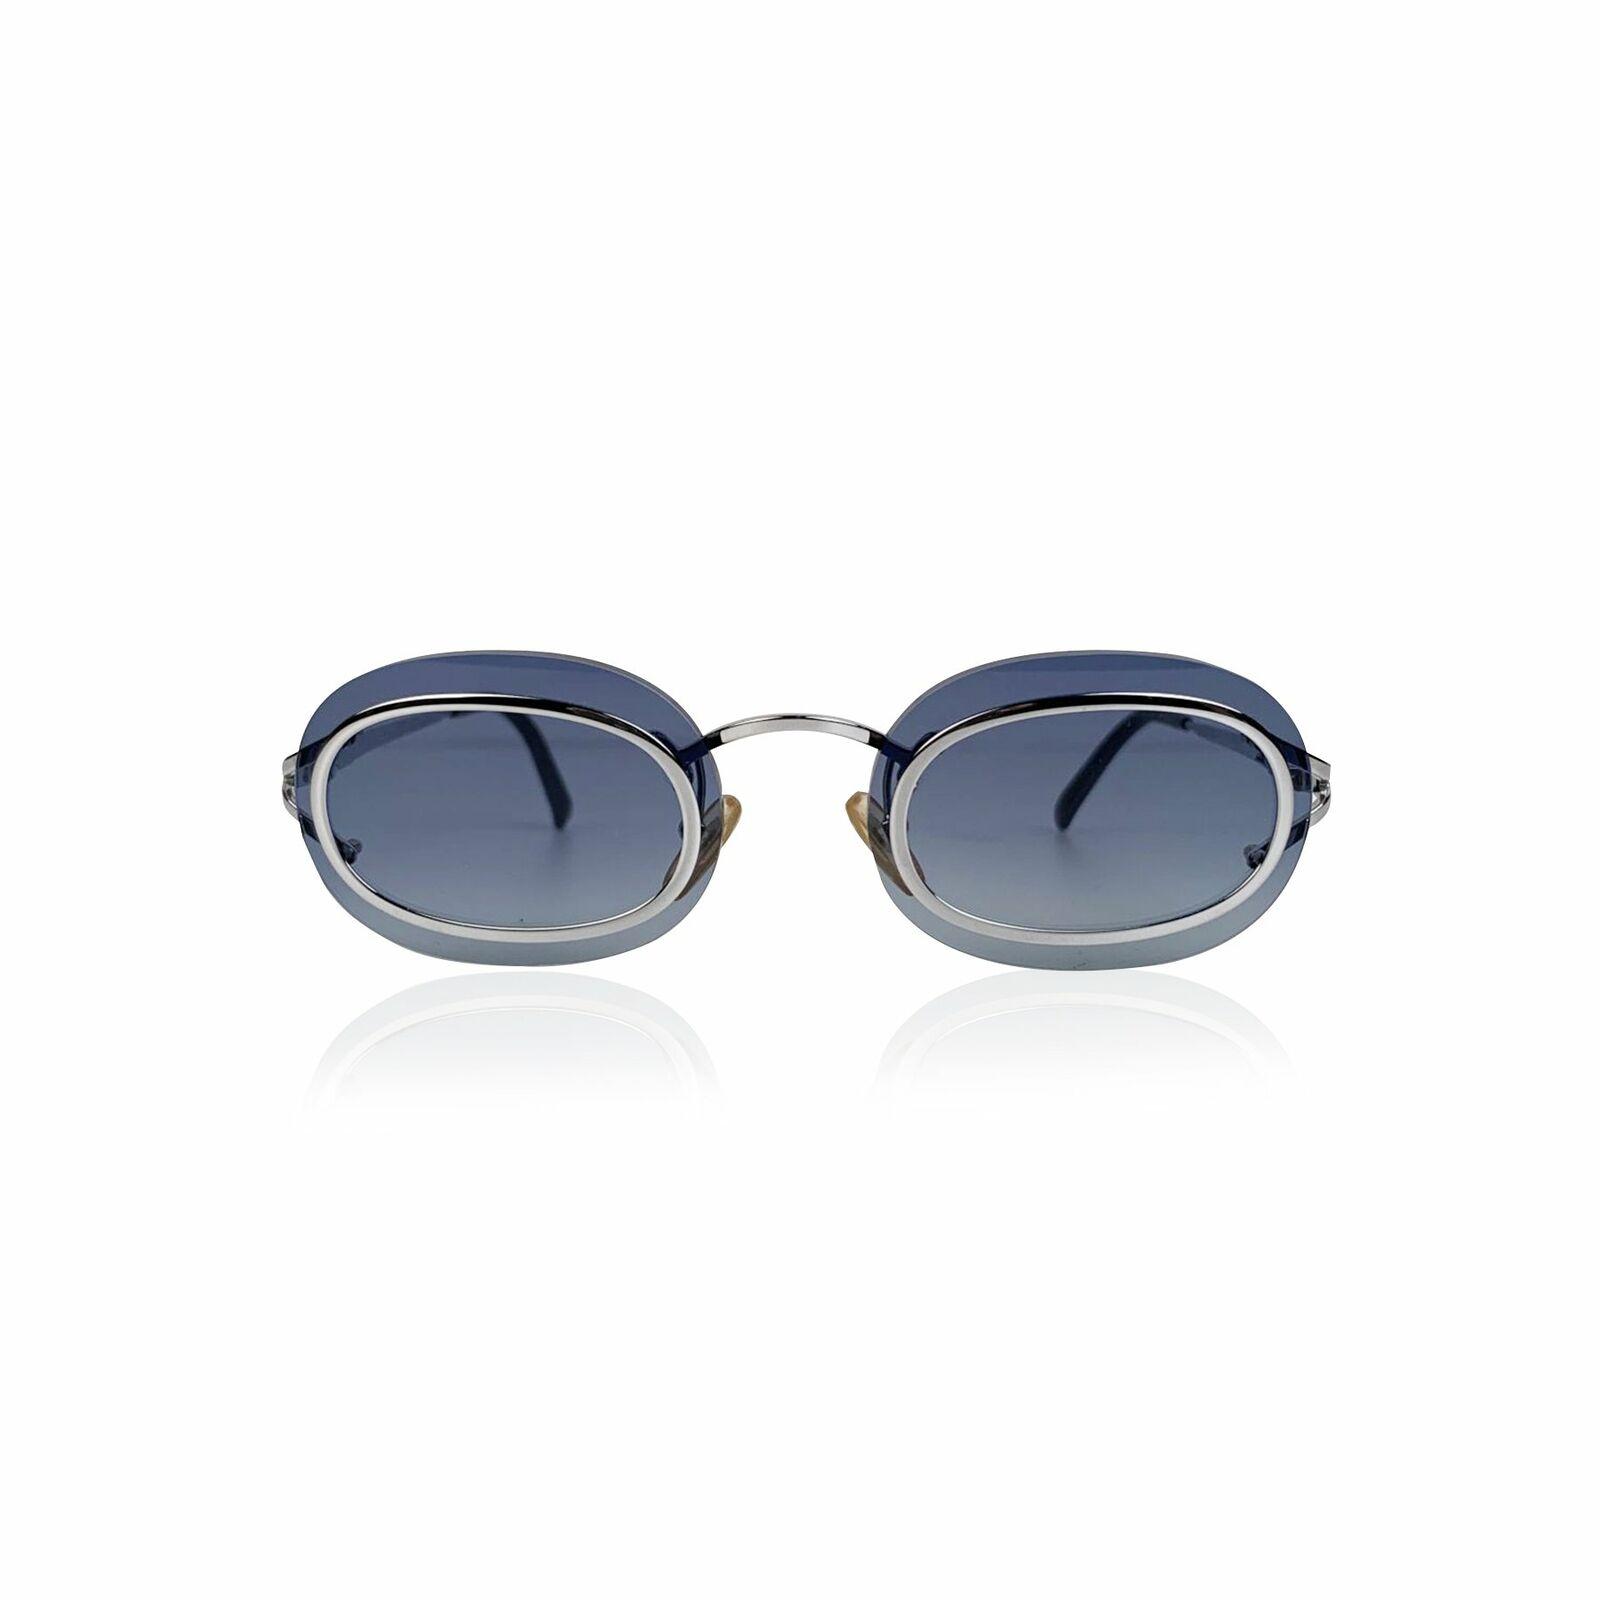 Christian Dior Sunglasses Vintage Metal Col. Blue 2970-show original title